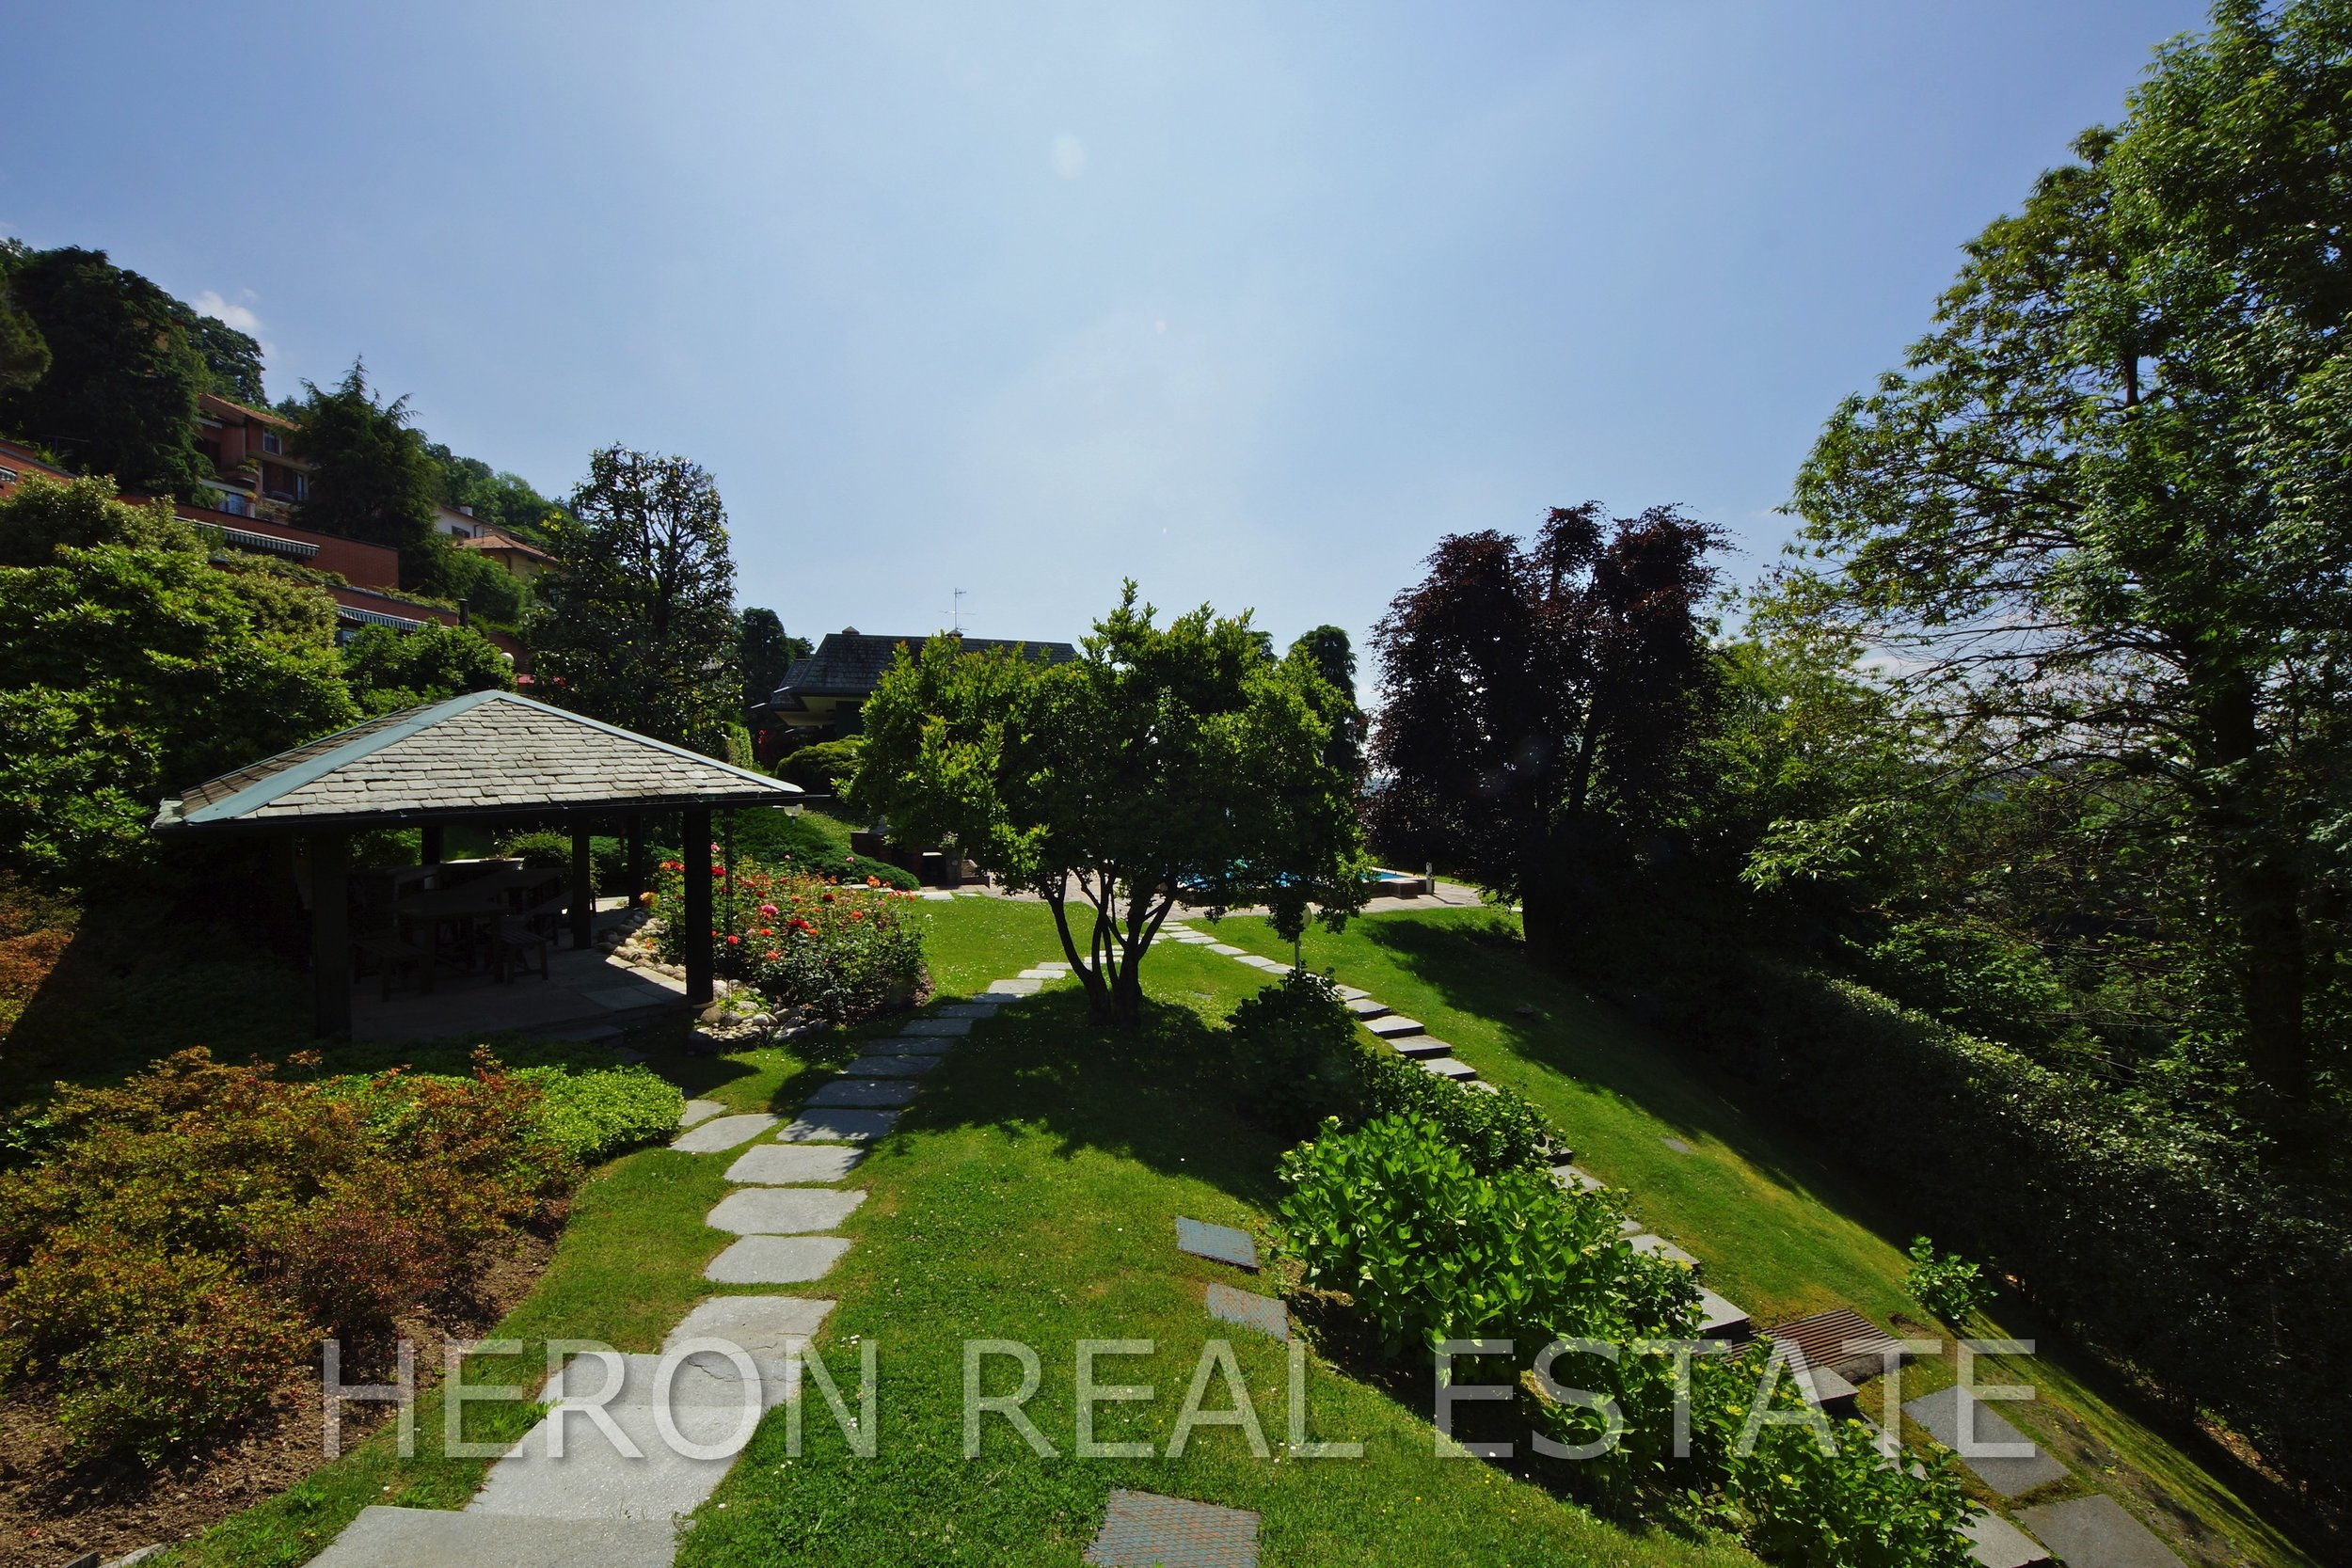 8 villa with view como.jpg